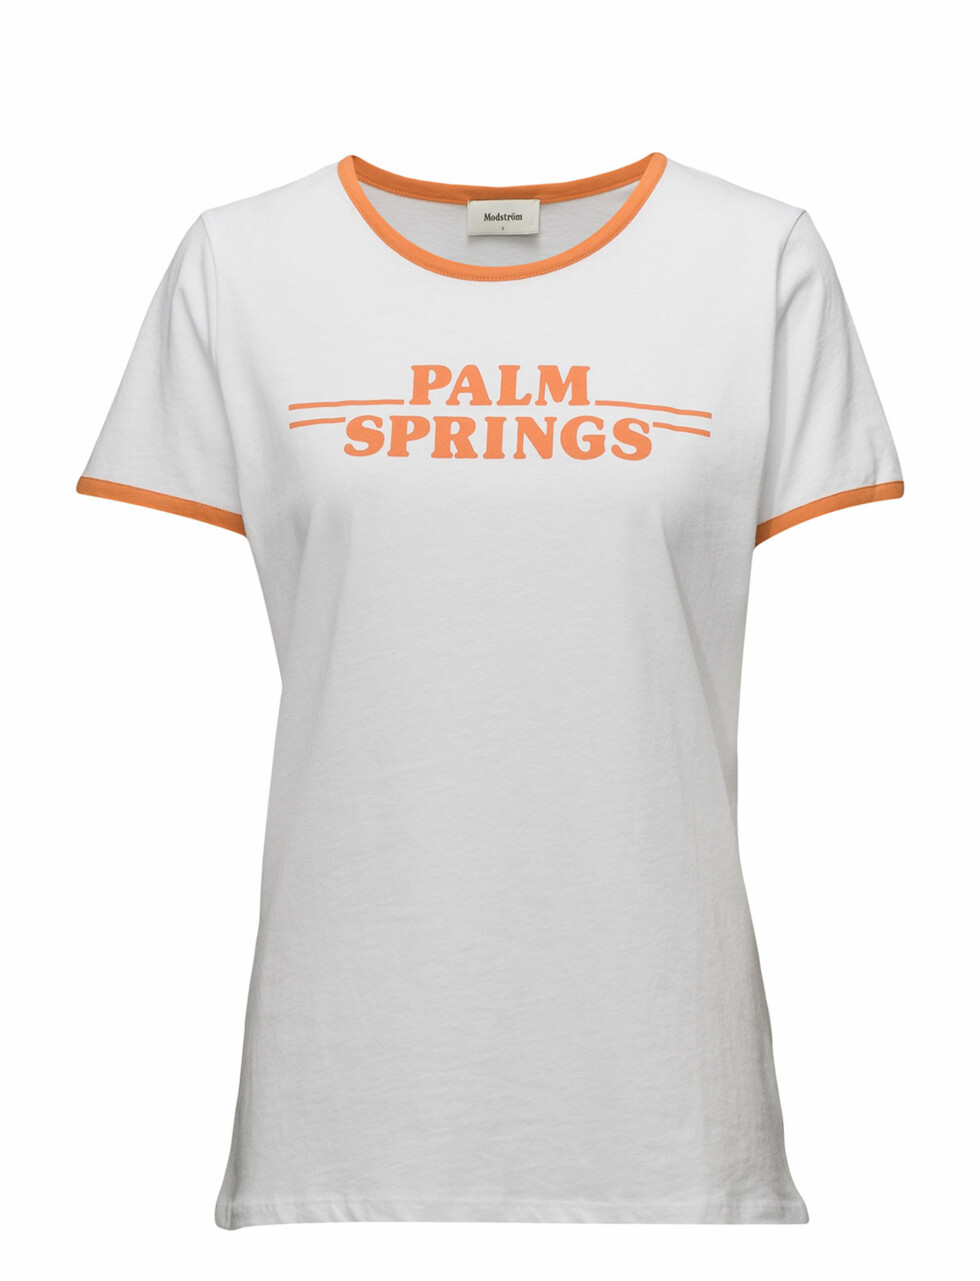 T-skjorte fra Modström |399,-| https://www.boozt.com/no/no/modstrom/glass-t-shirt_18122465/18122469?navId=67384&group=listing&position=1000000